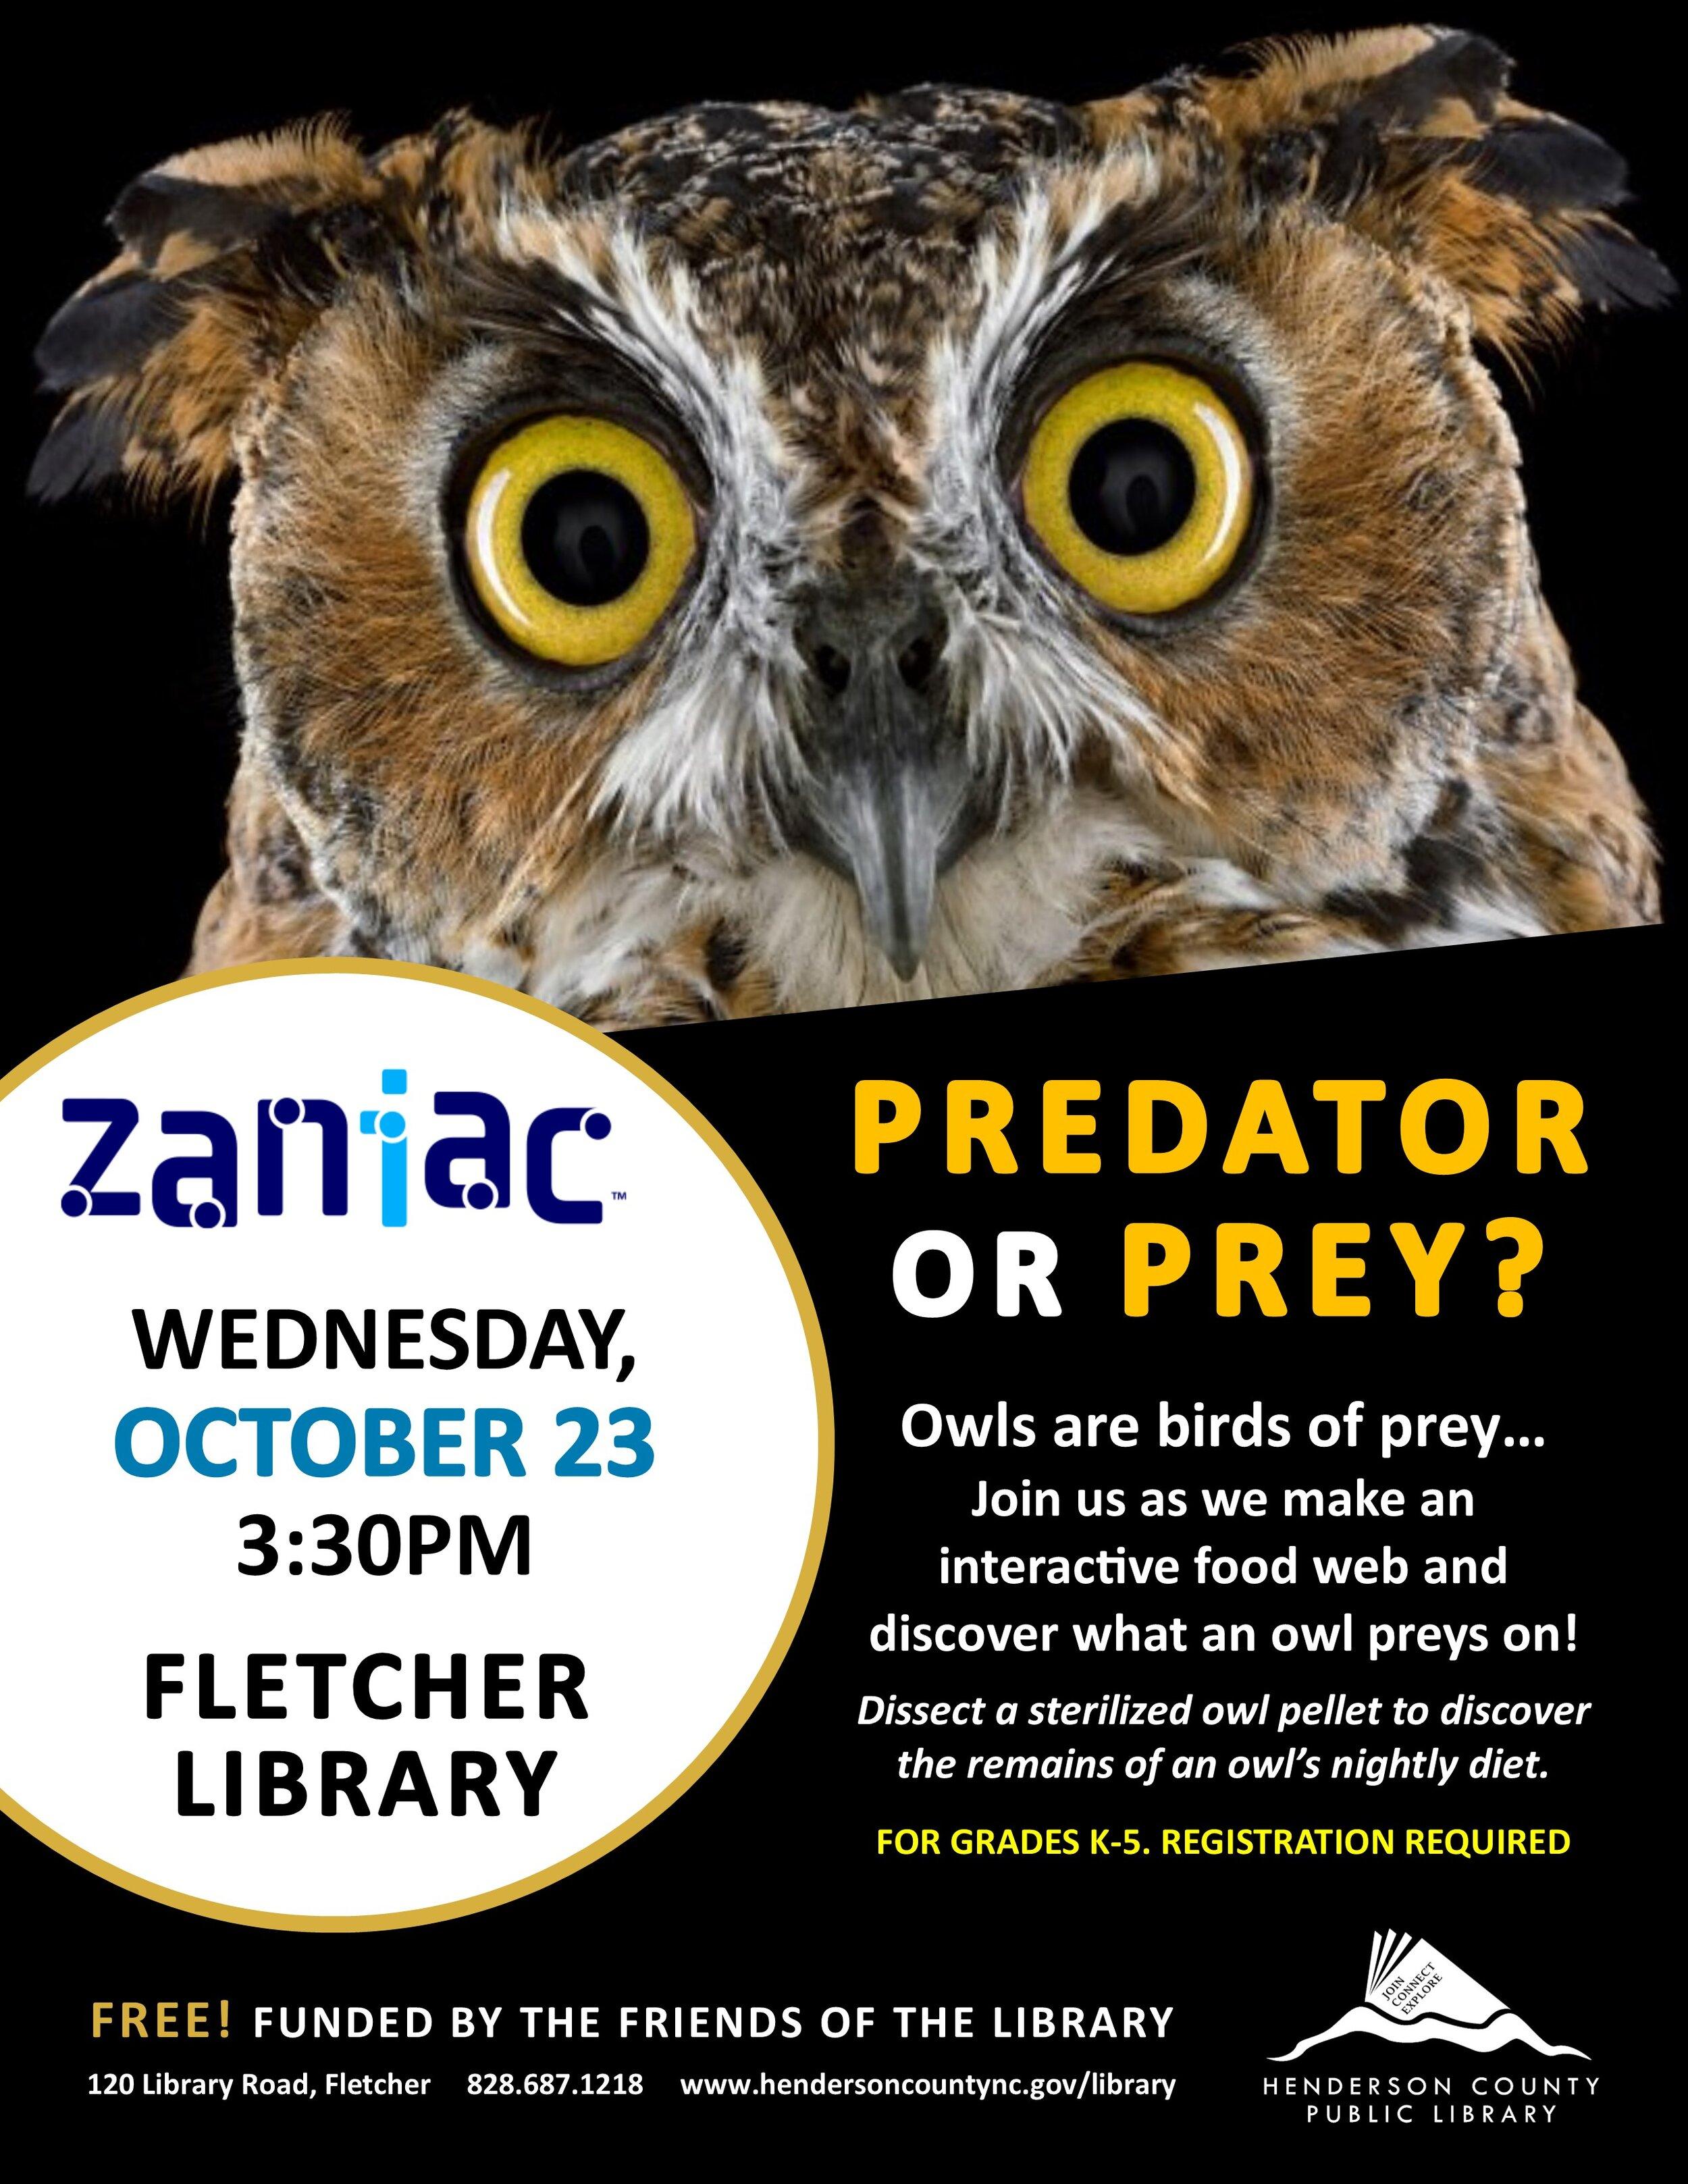 FL- Zaniac Predator or Prey.jpg